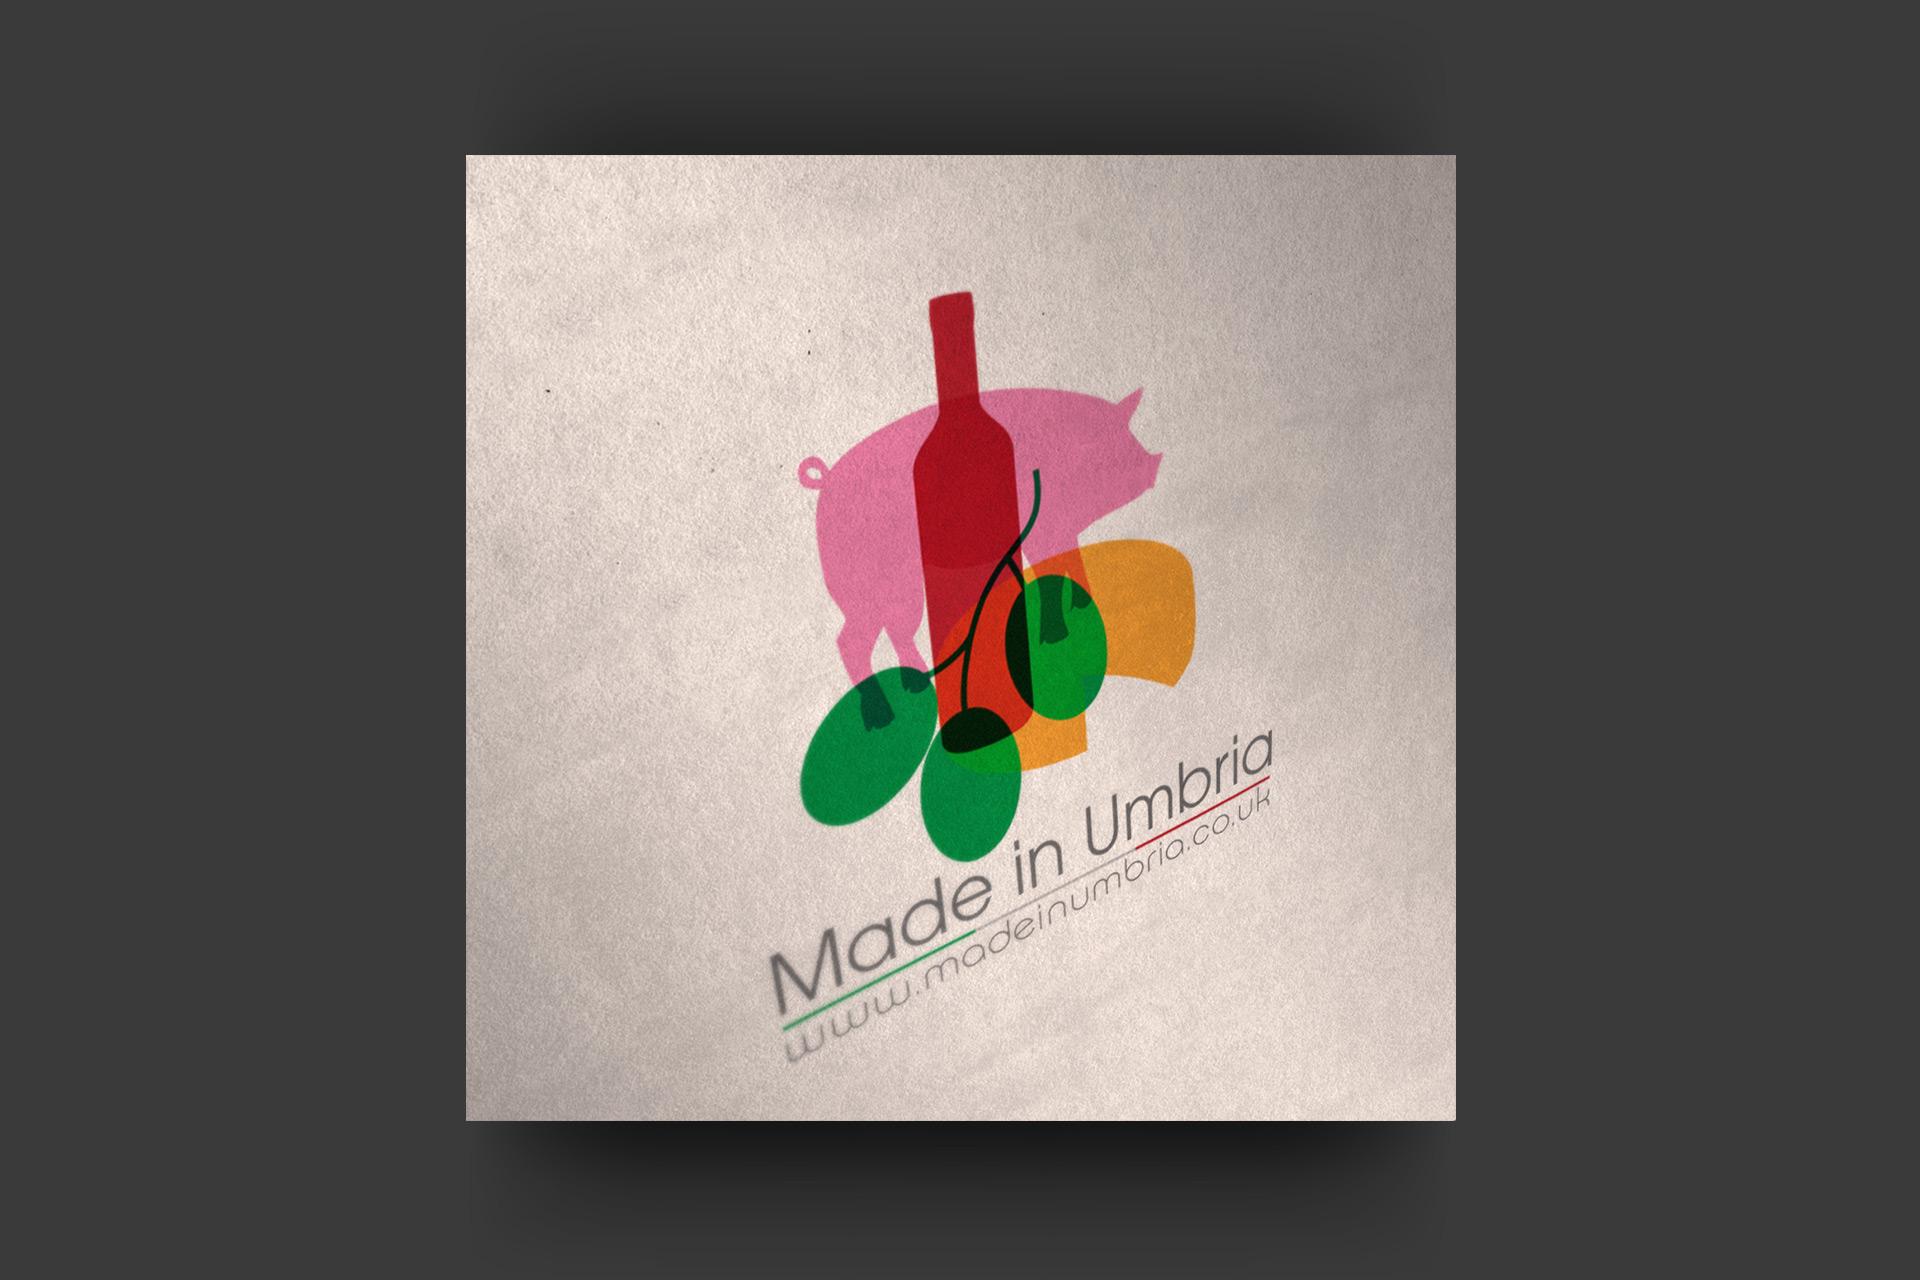 Made-in-Umbria-2016-01-B